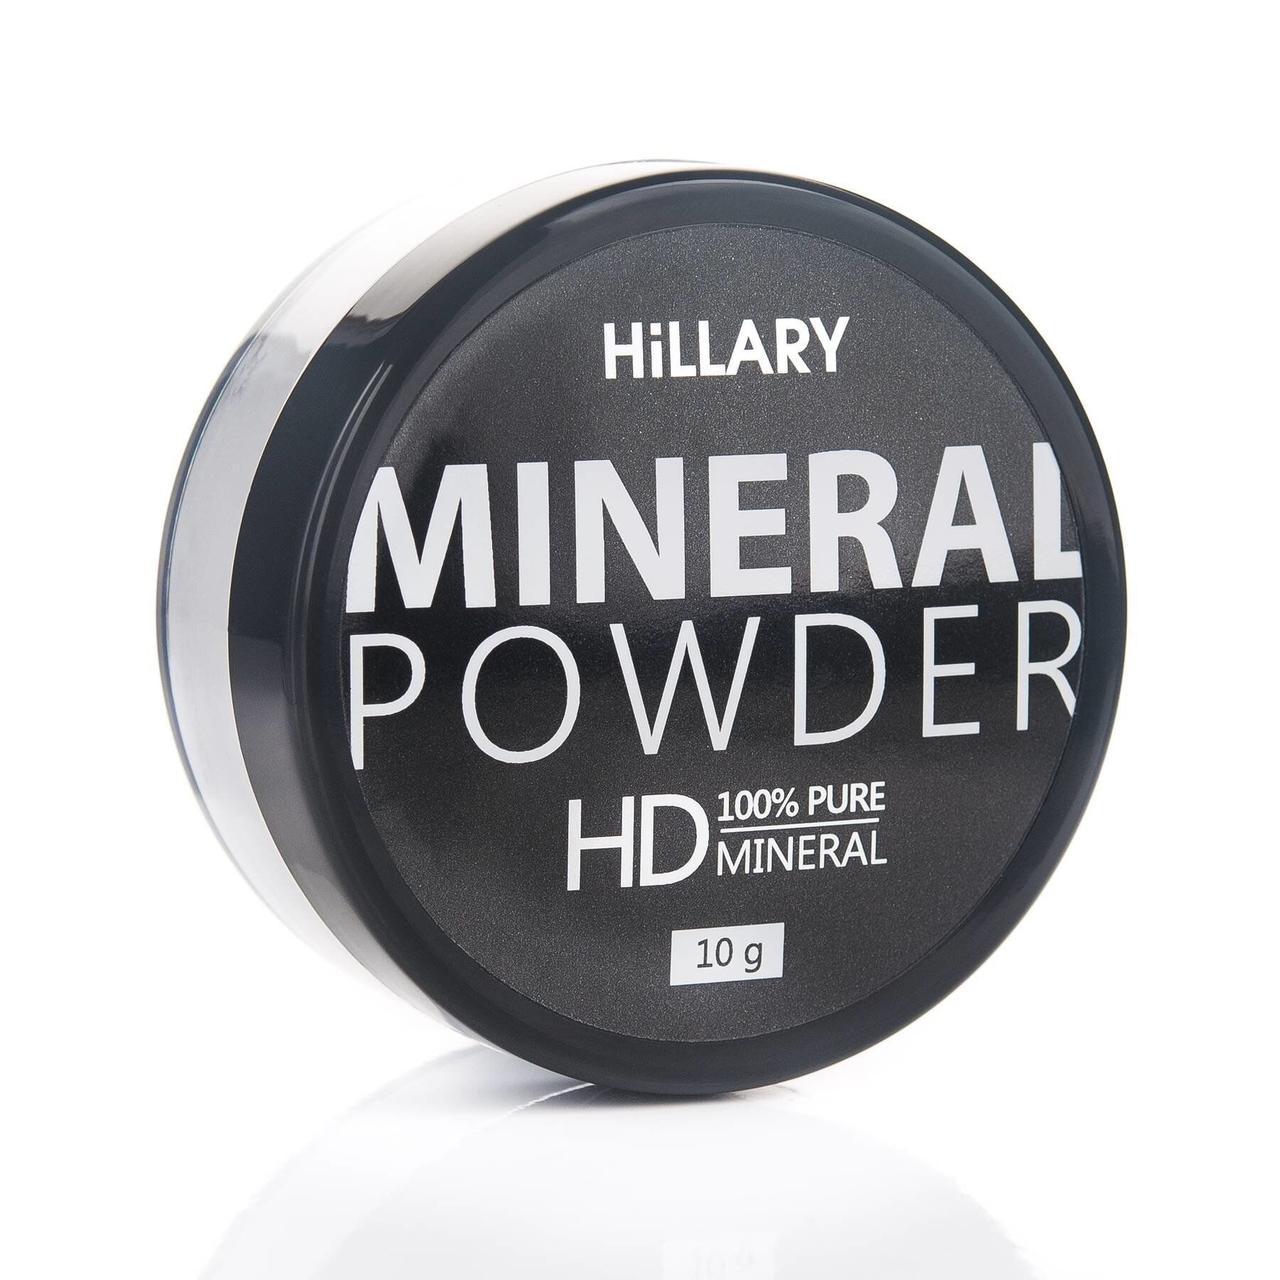 Прозора розсипчаста пудра для обличчя Hillary Mineral Powder HD, 10 г